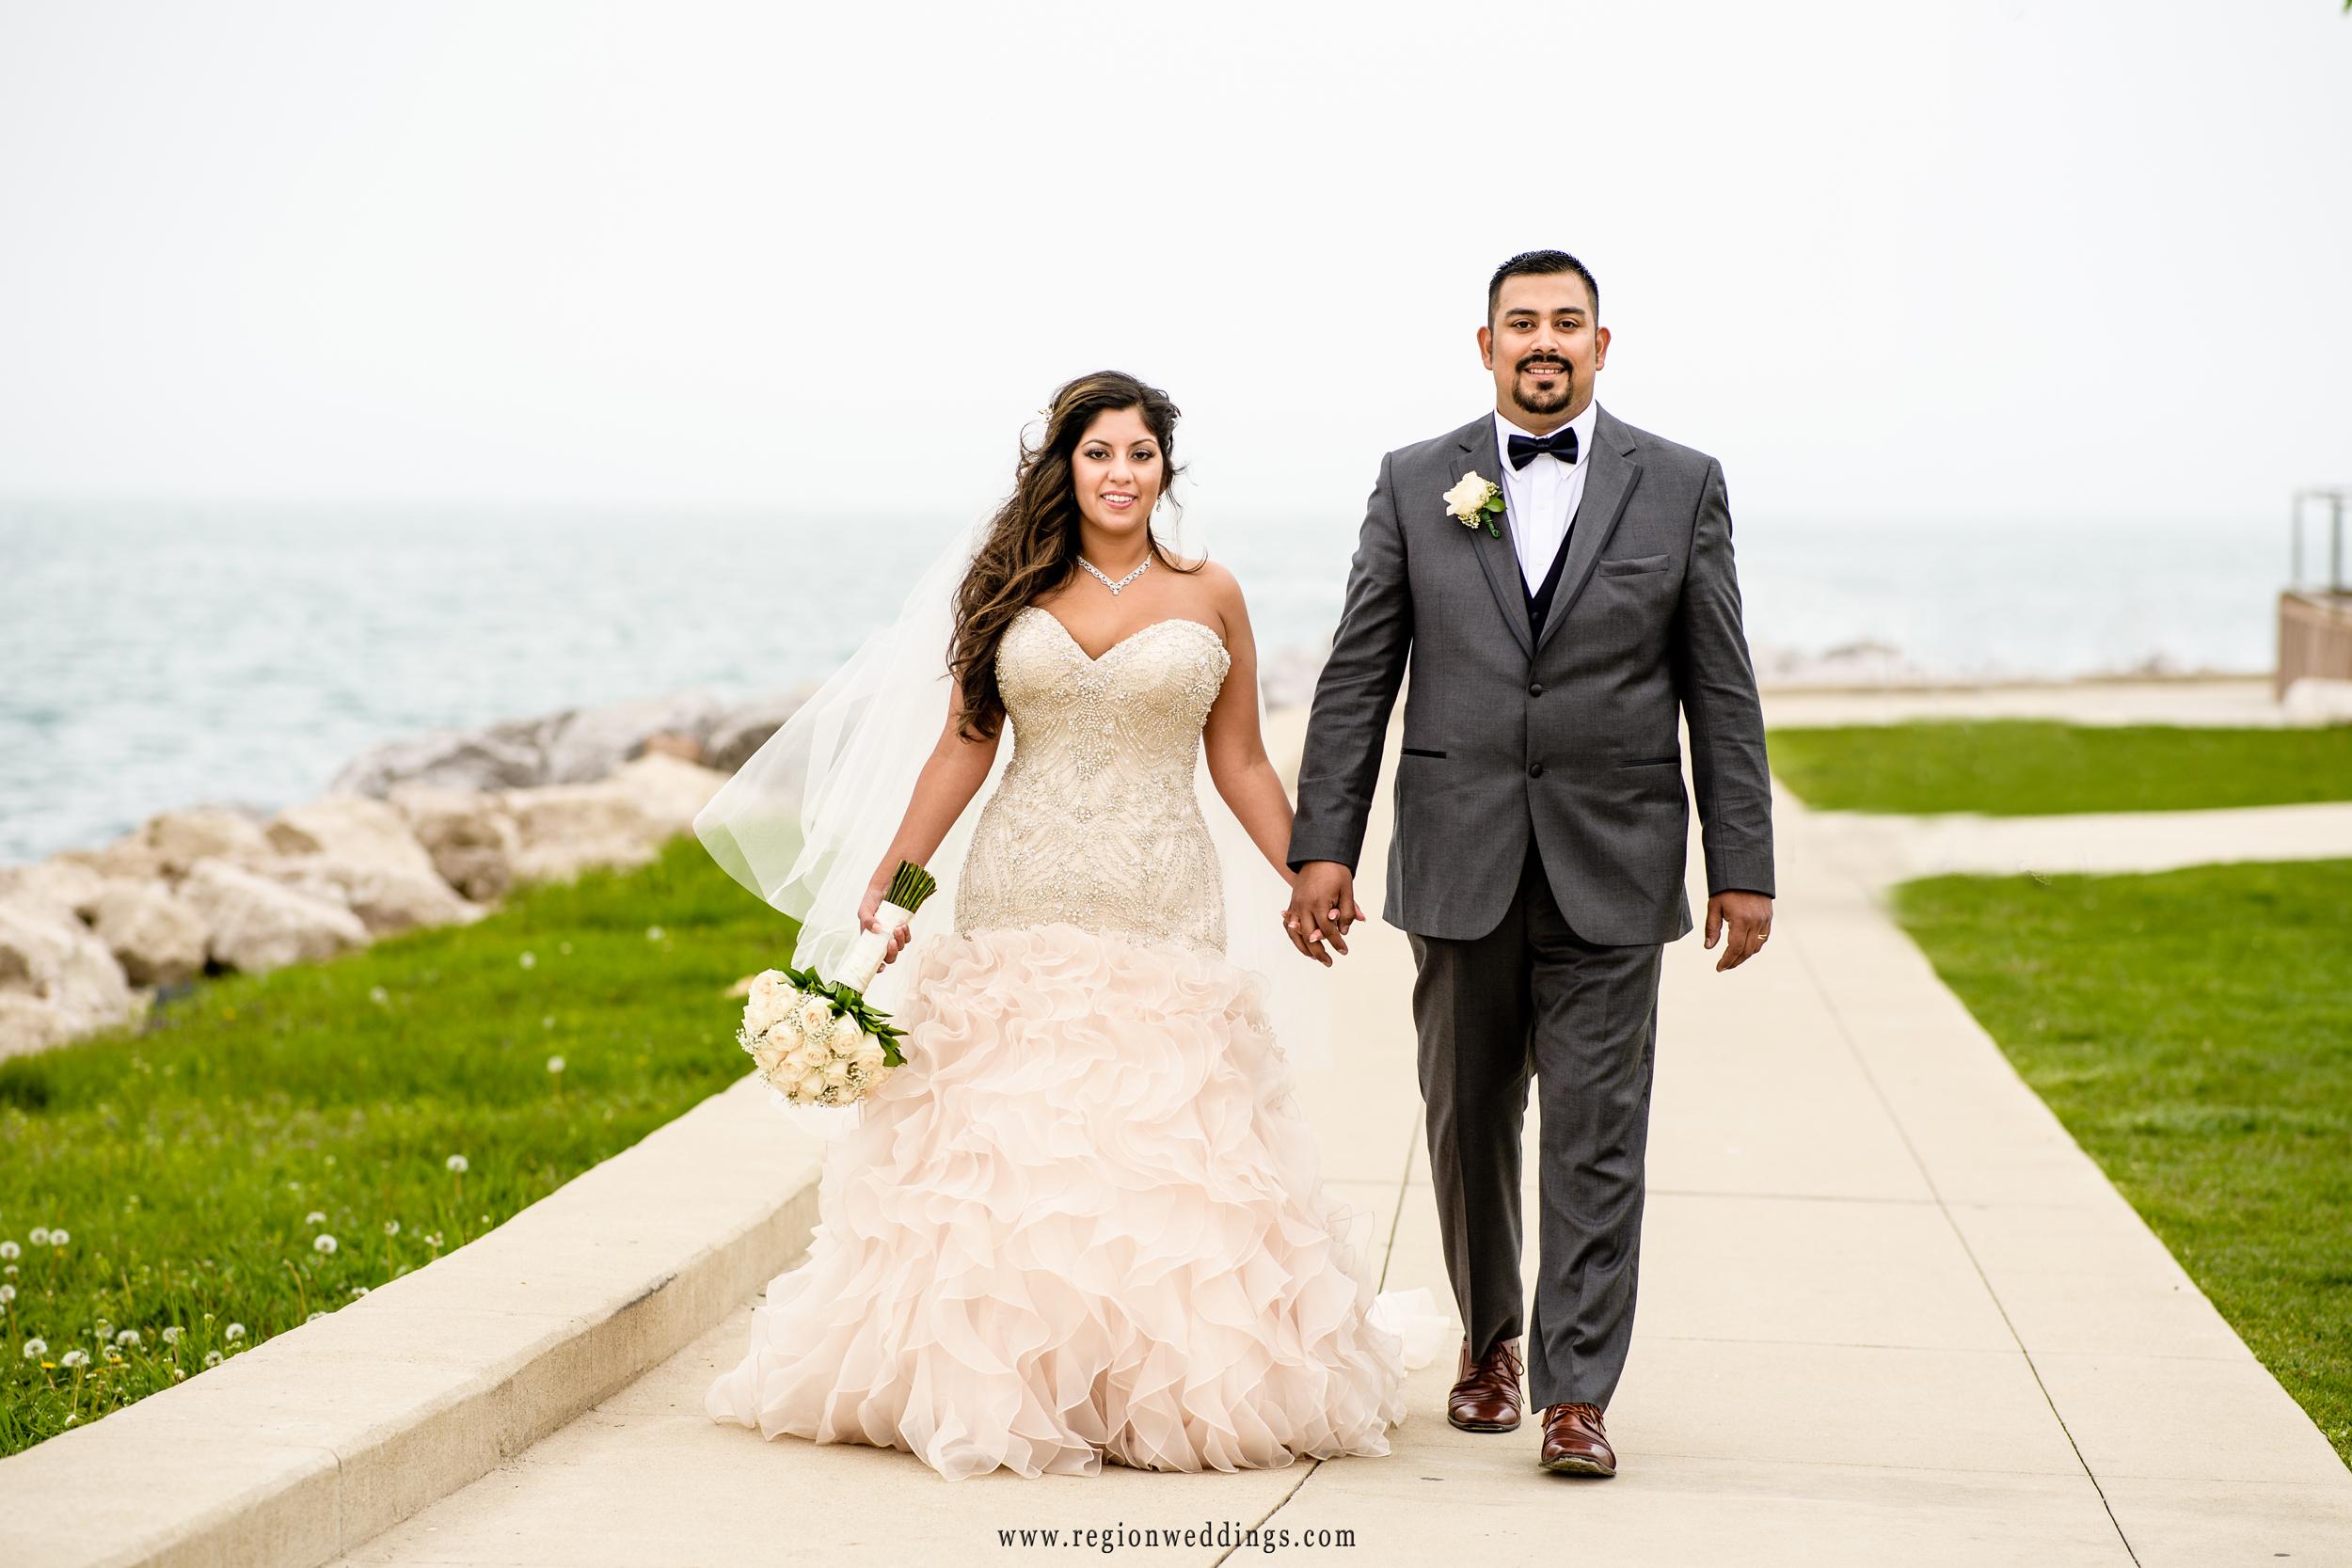 Romantic walk along Lake michigan for the bride and groom.